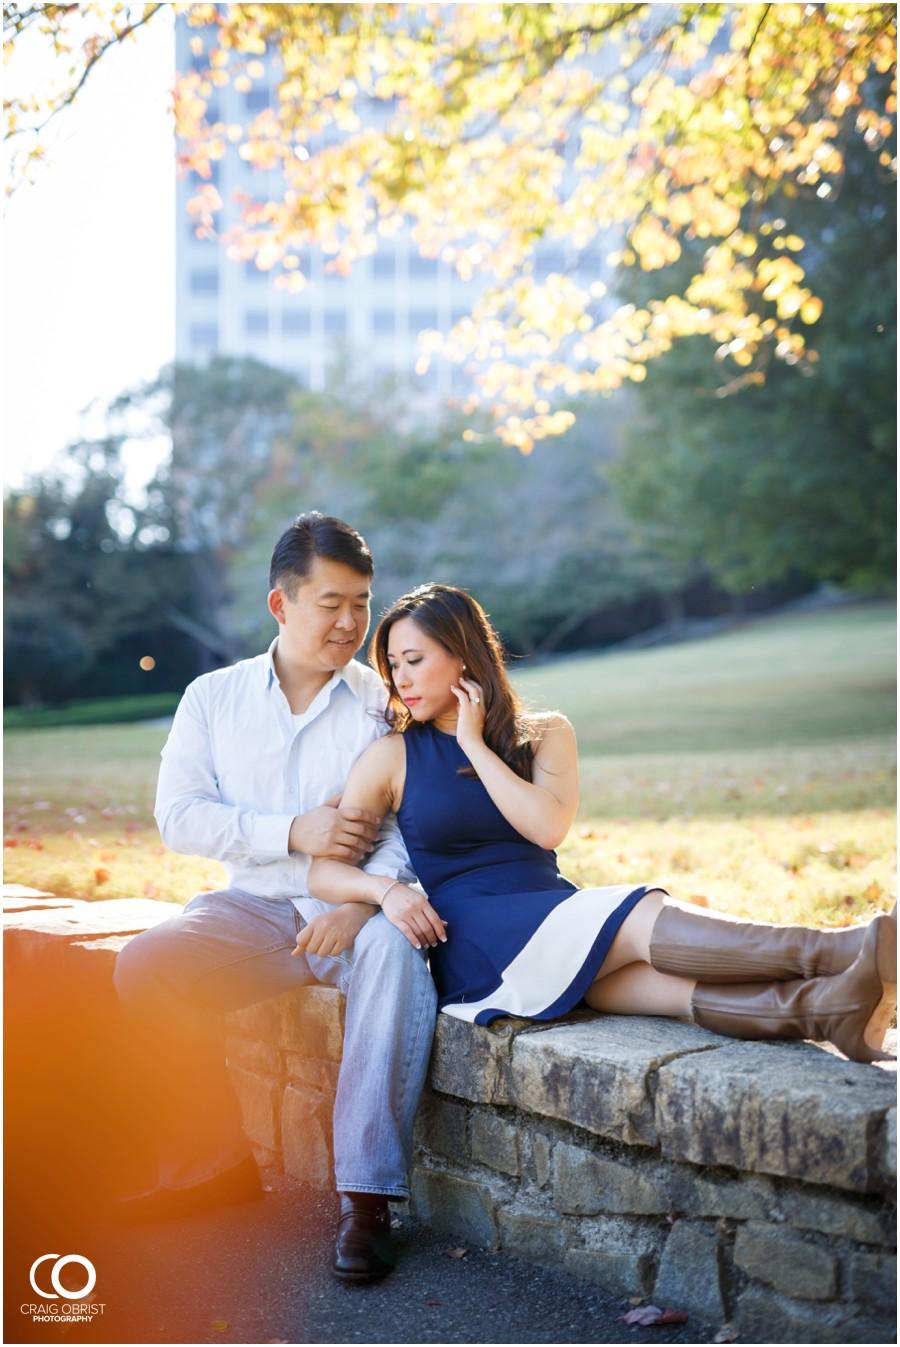 Buckhead Wedding Engagement Portraits Sunset Atlanta_0002.jpg